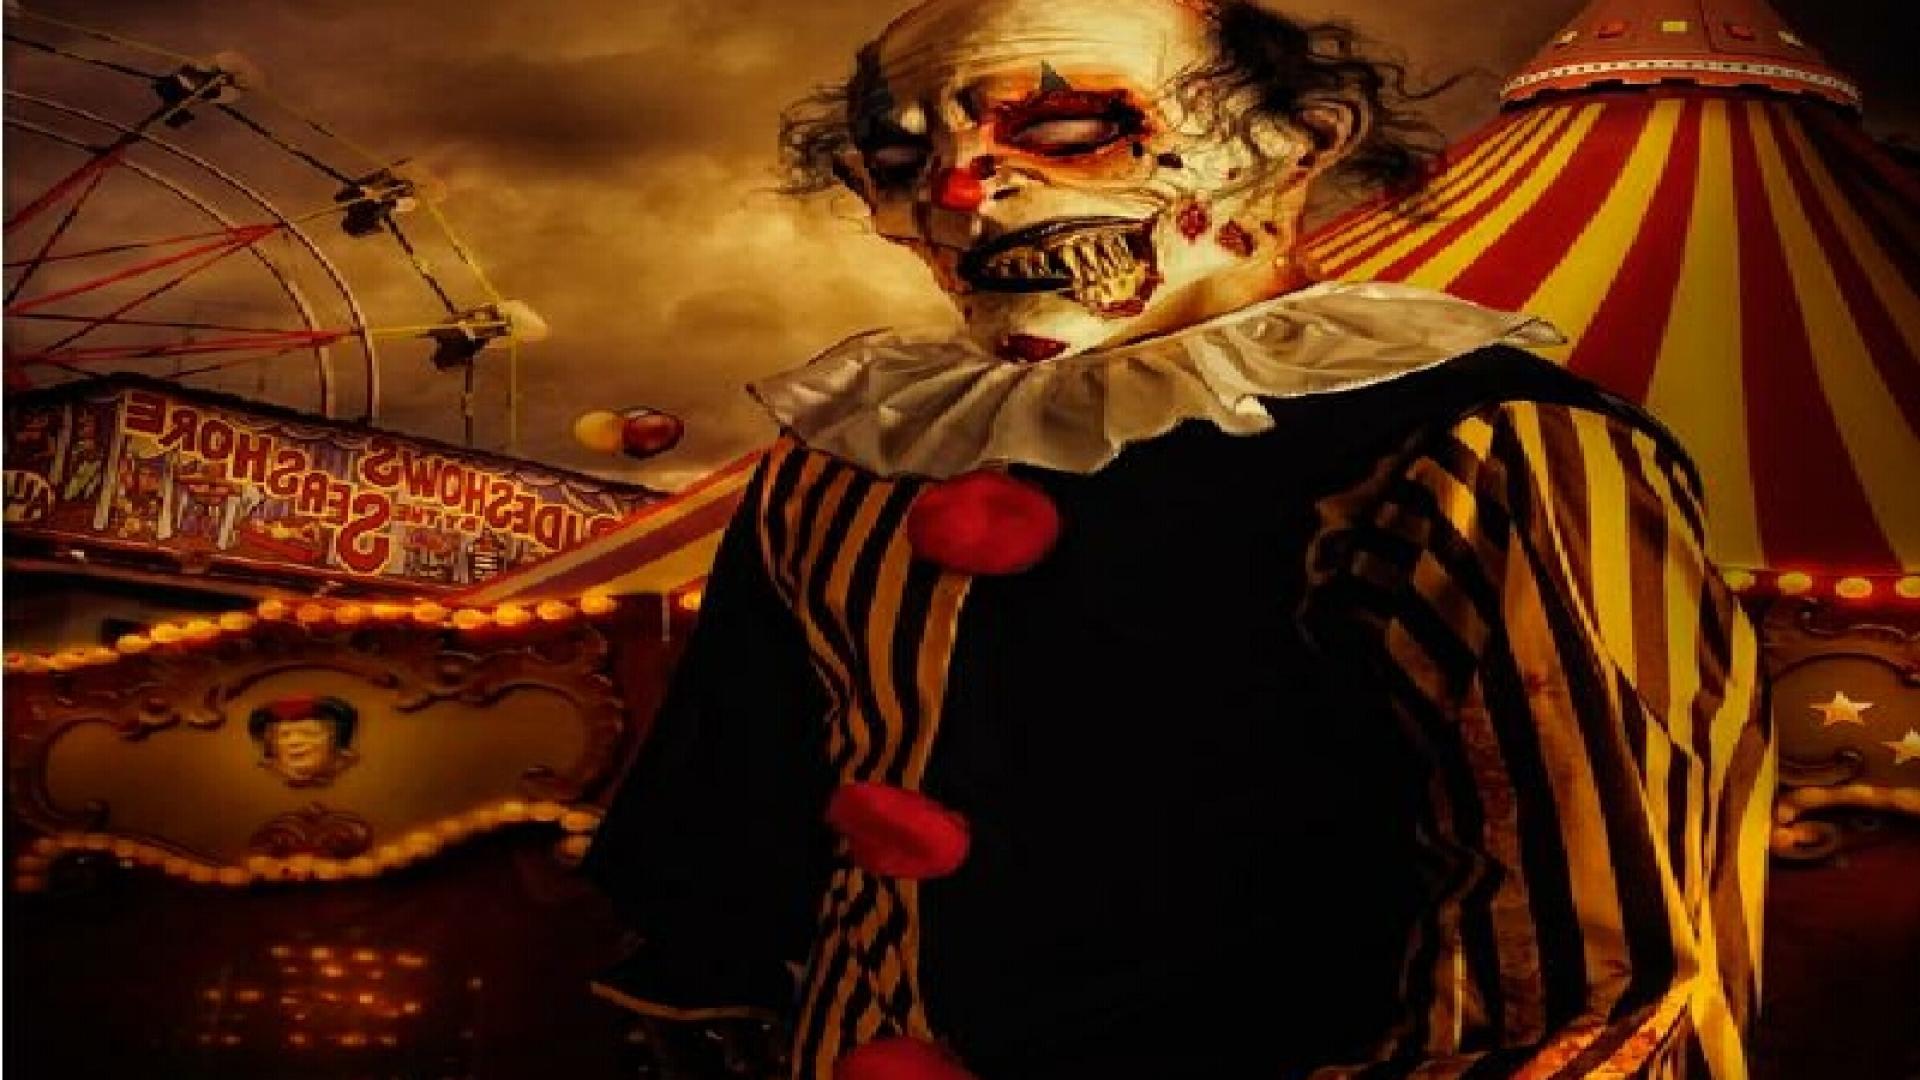 Fall Live Wallpaper Phone Killer Clown Wallpapers 36 Wallpapers Adorable Wallpapers